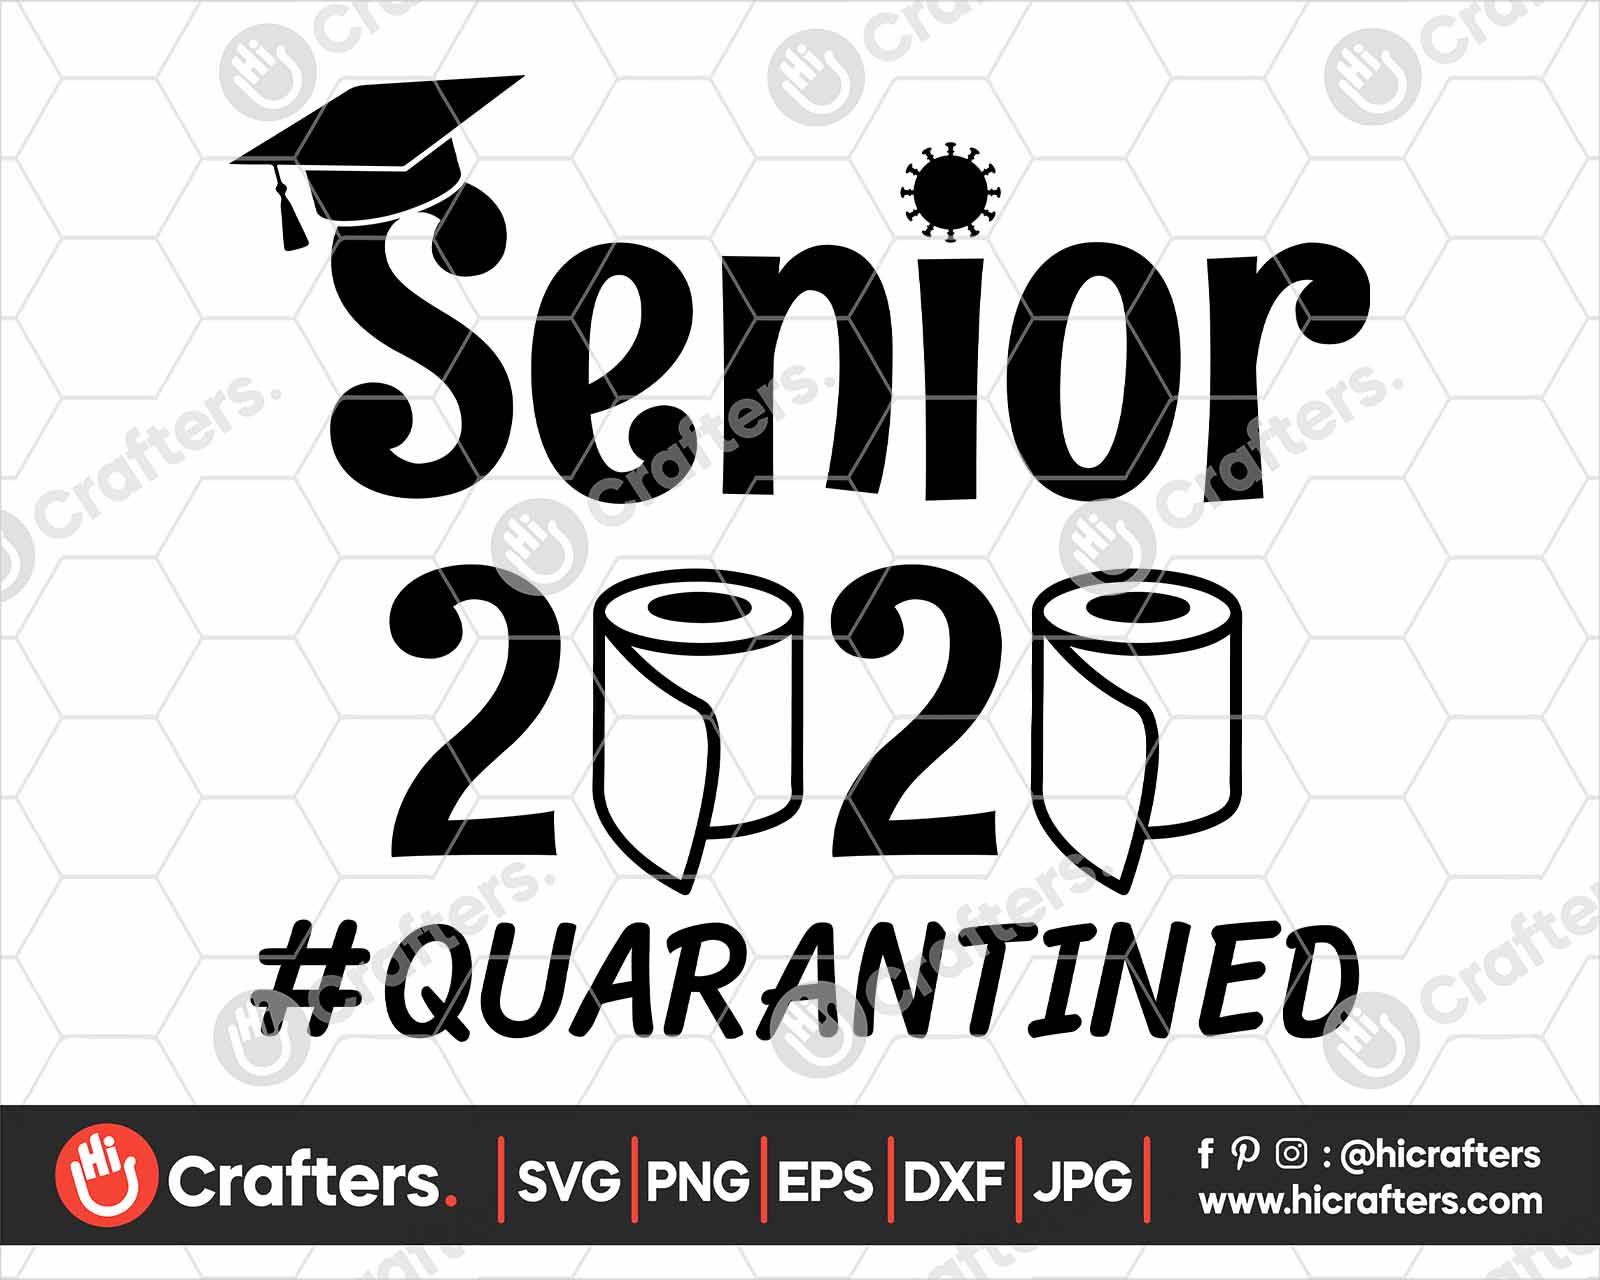 19+ Senior 2020 Svg Free Pictures